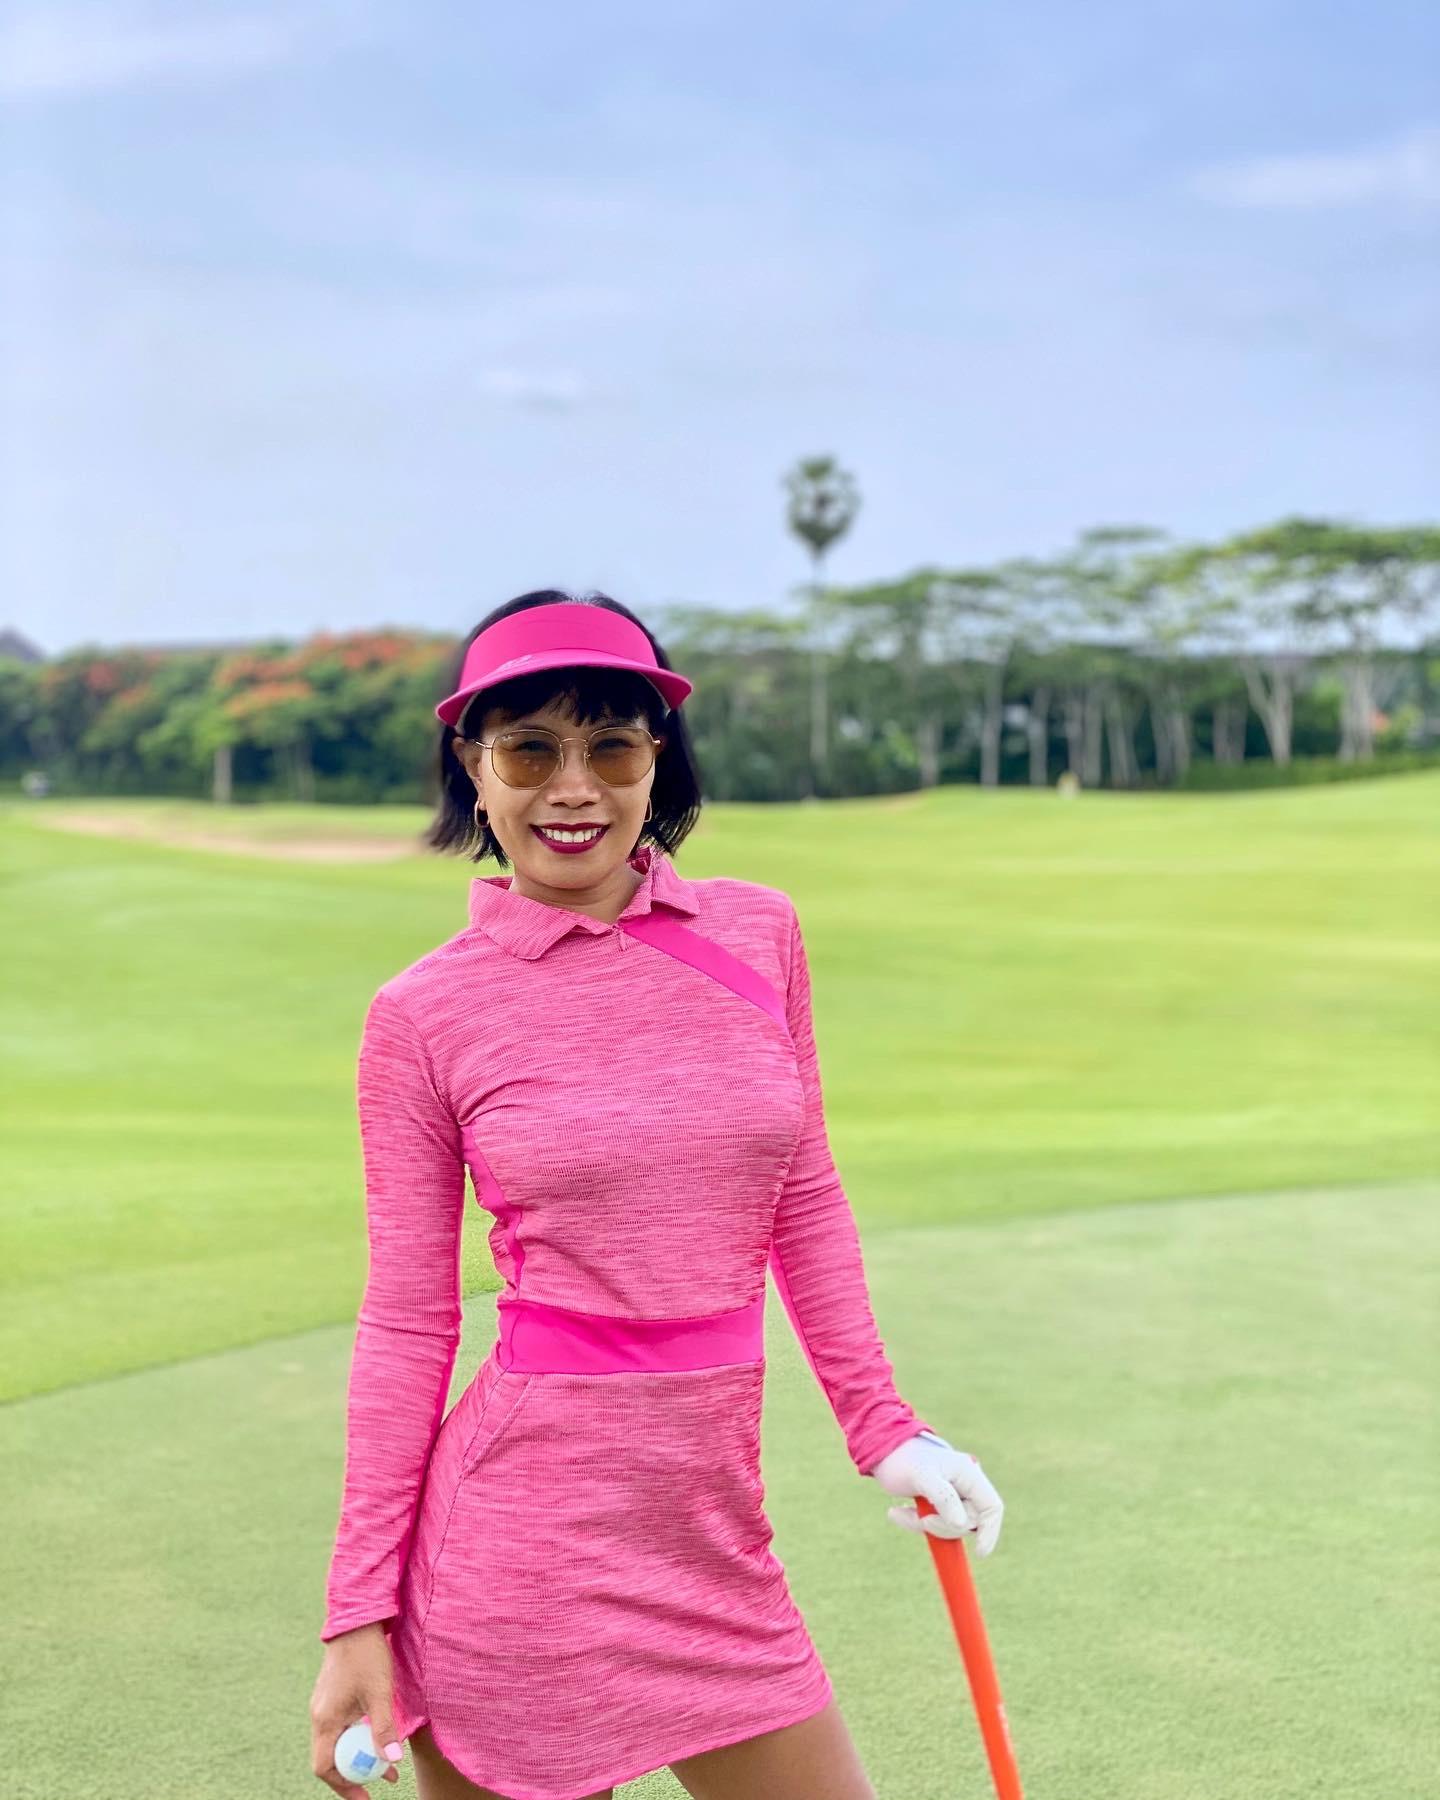 GD-010 || Golf Dress Pink With Dark Pink Texture And Trim